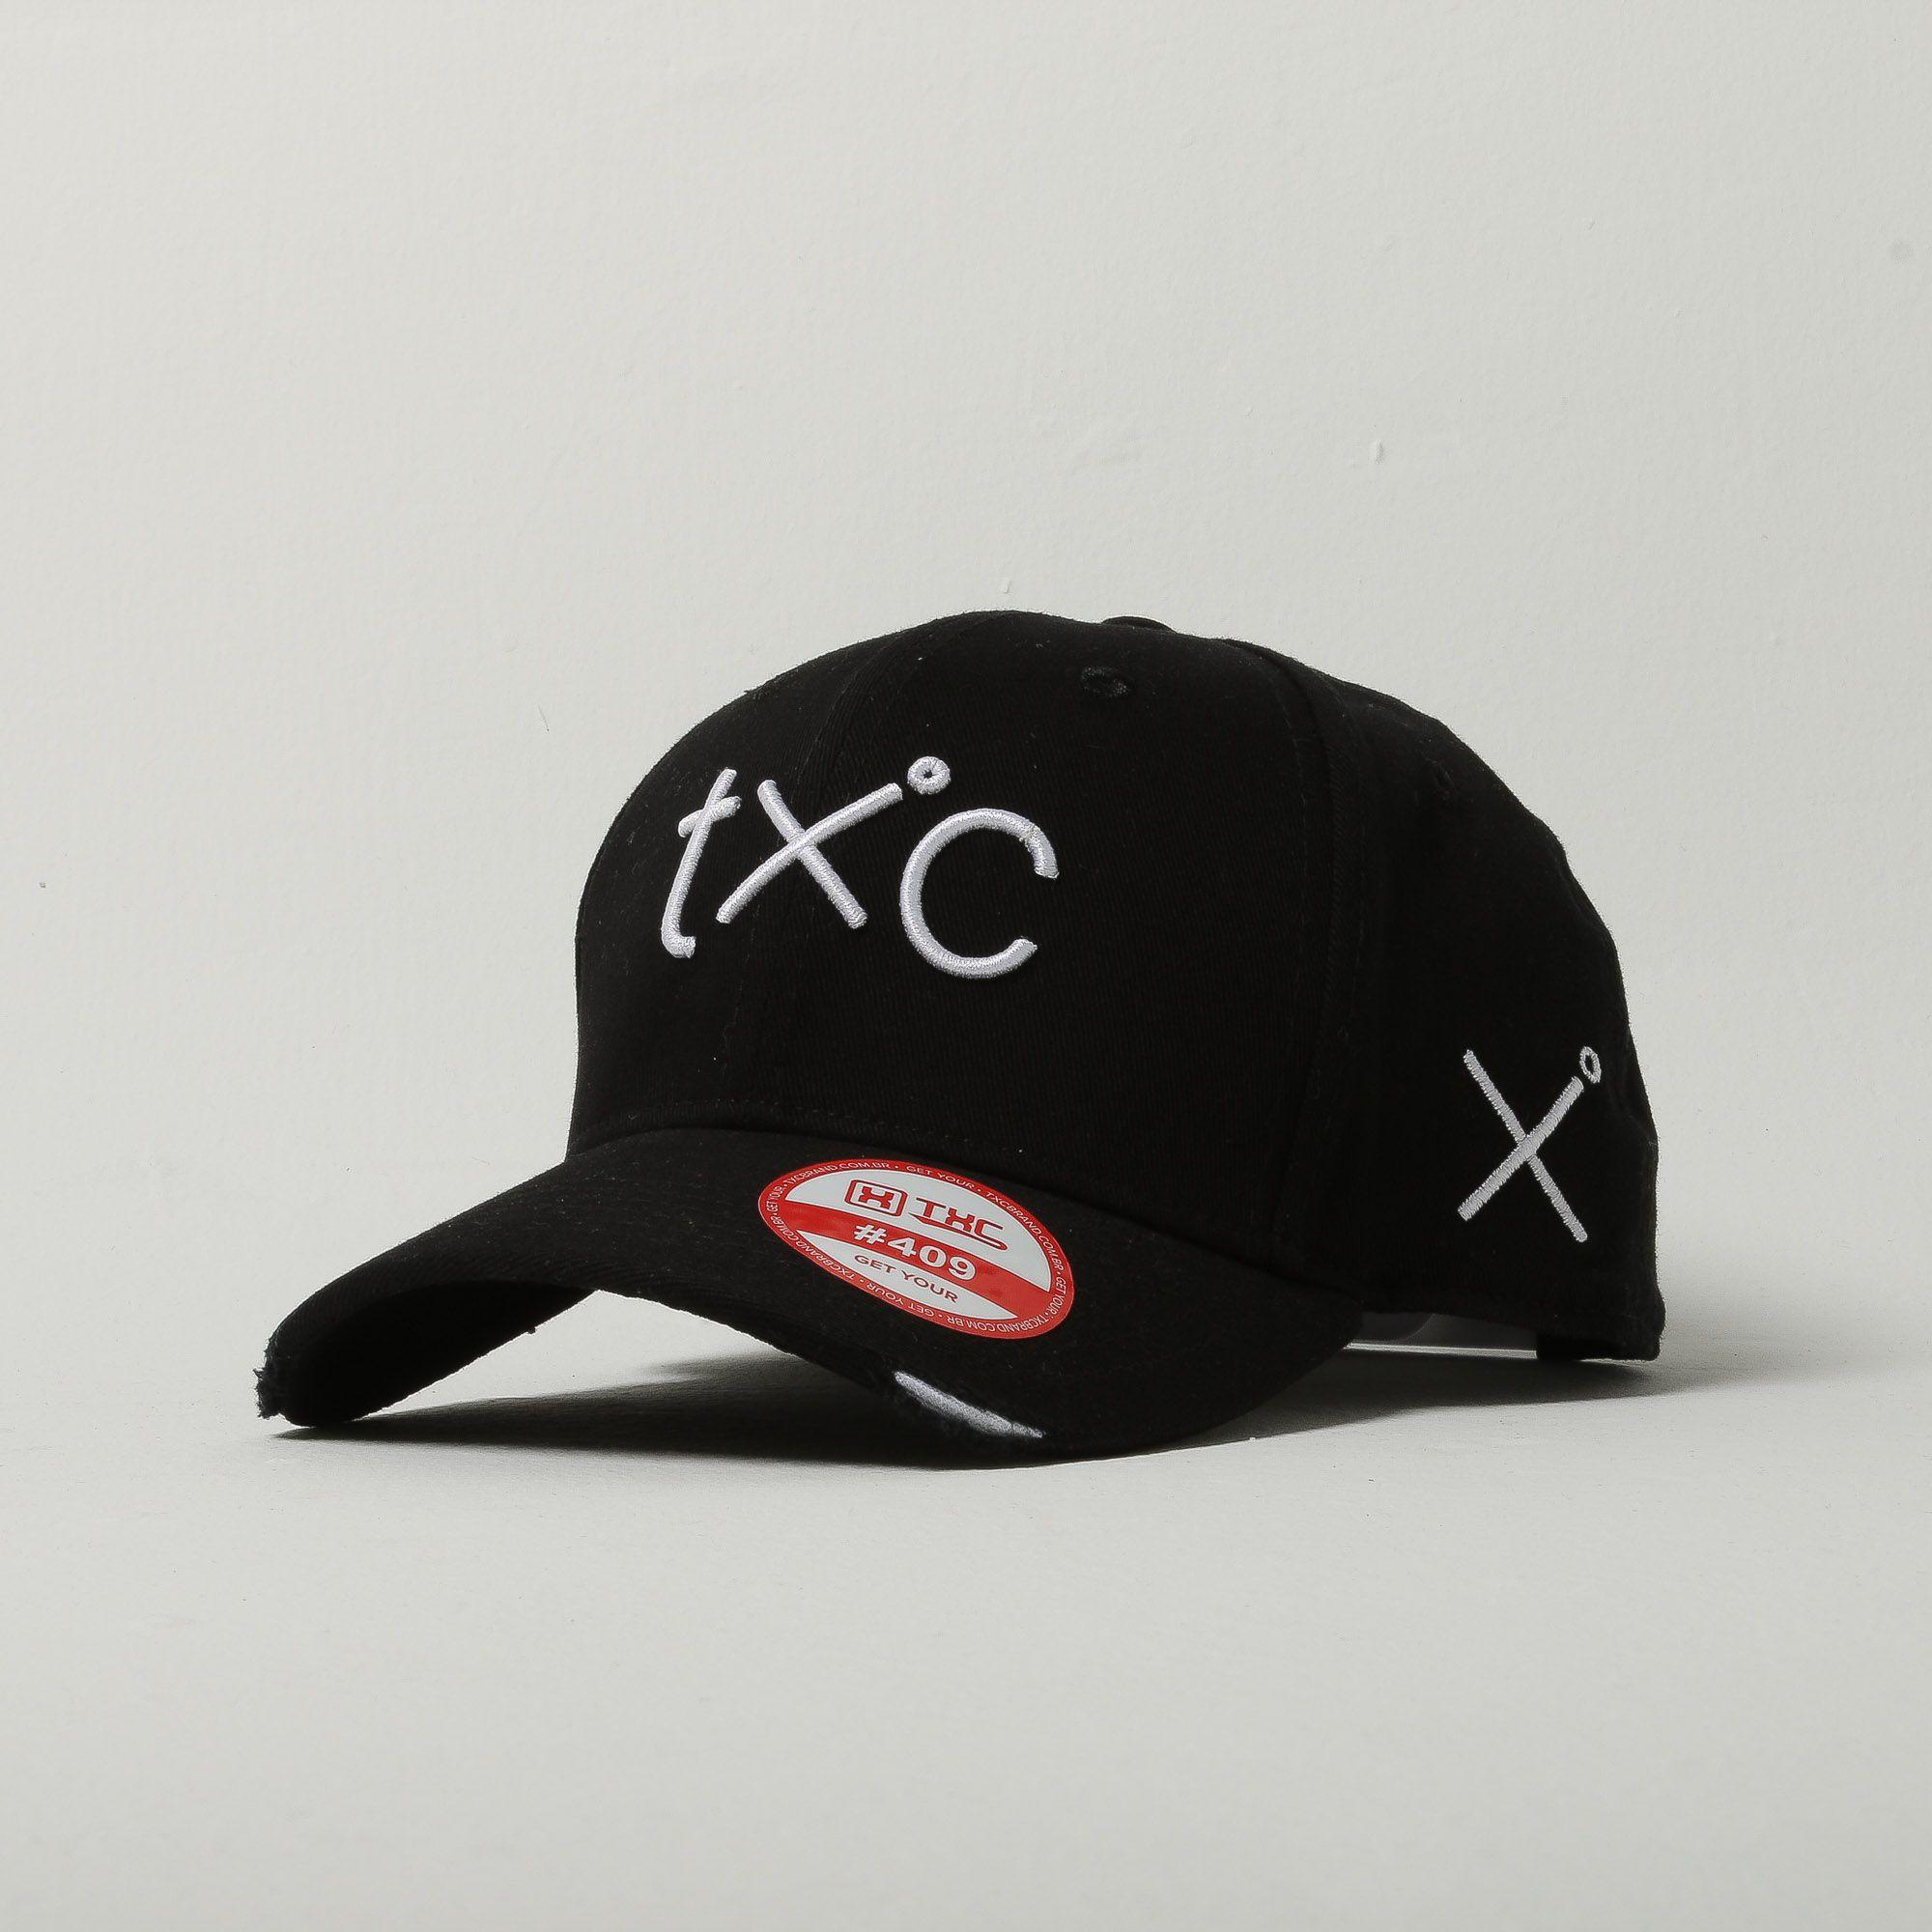 Boné TXC Brand aba curva 854c